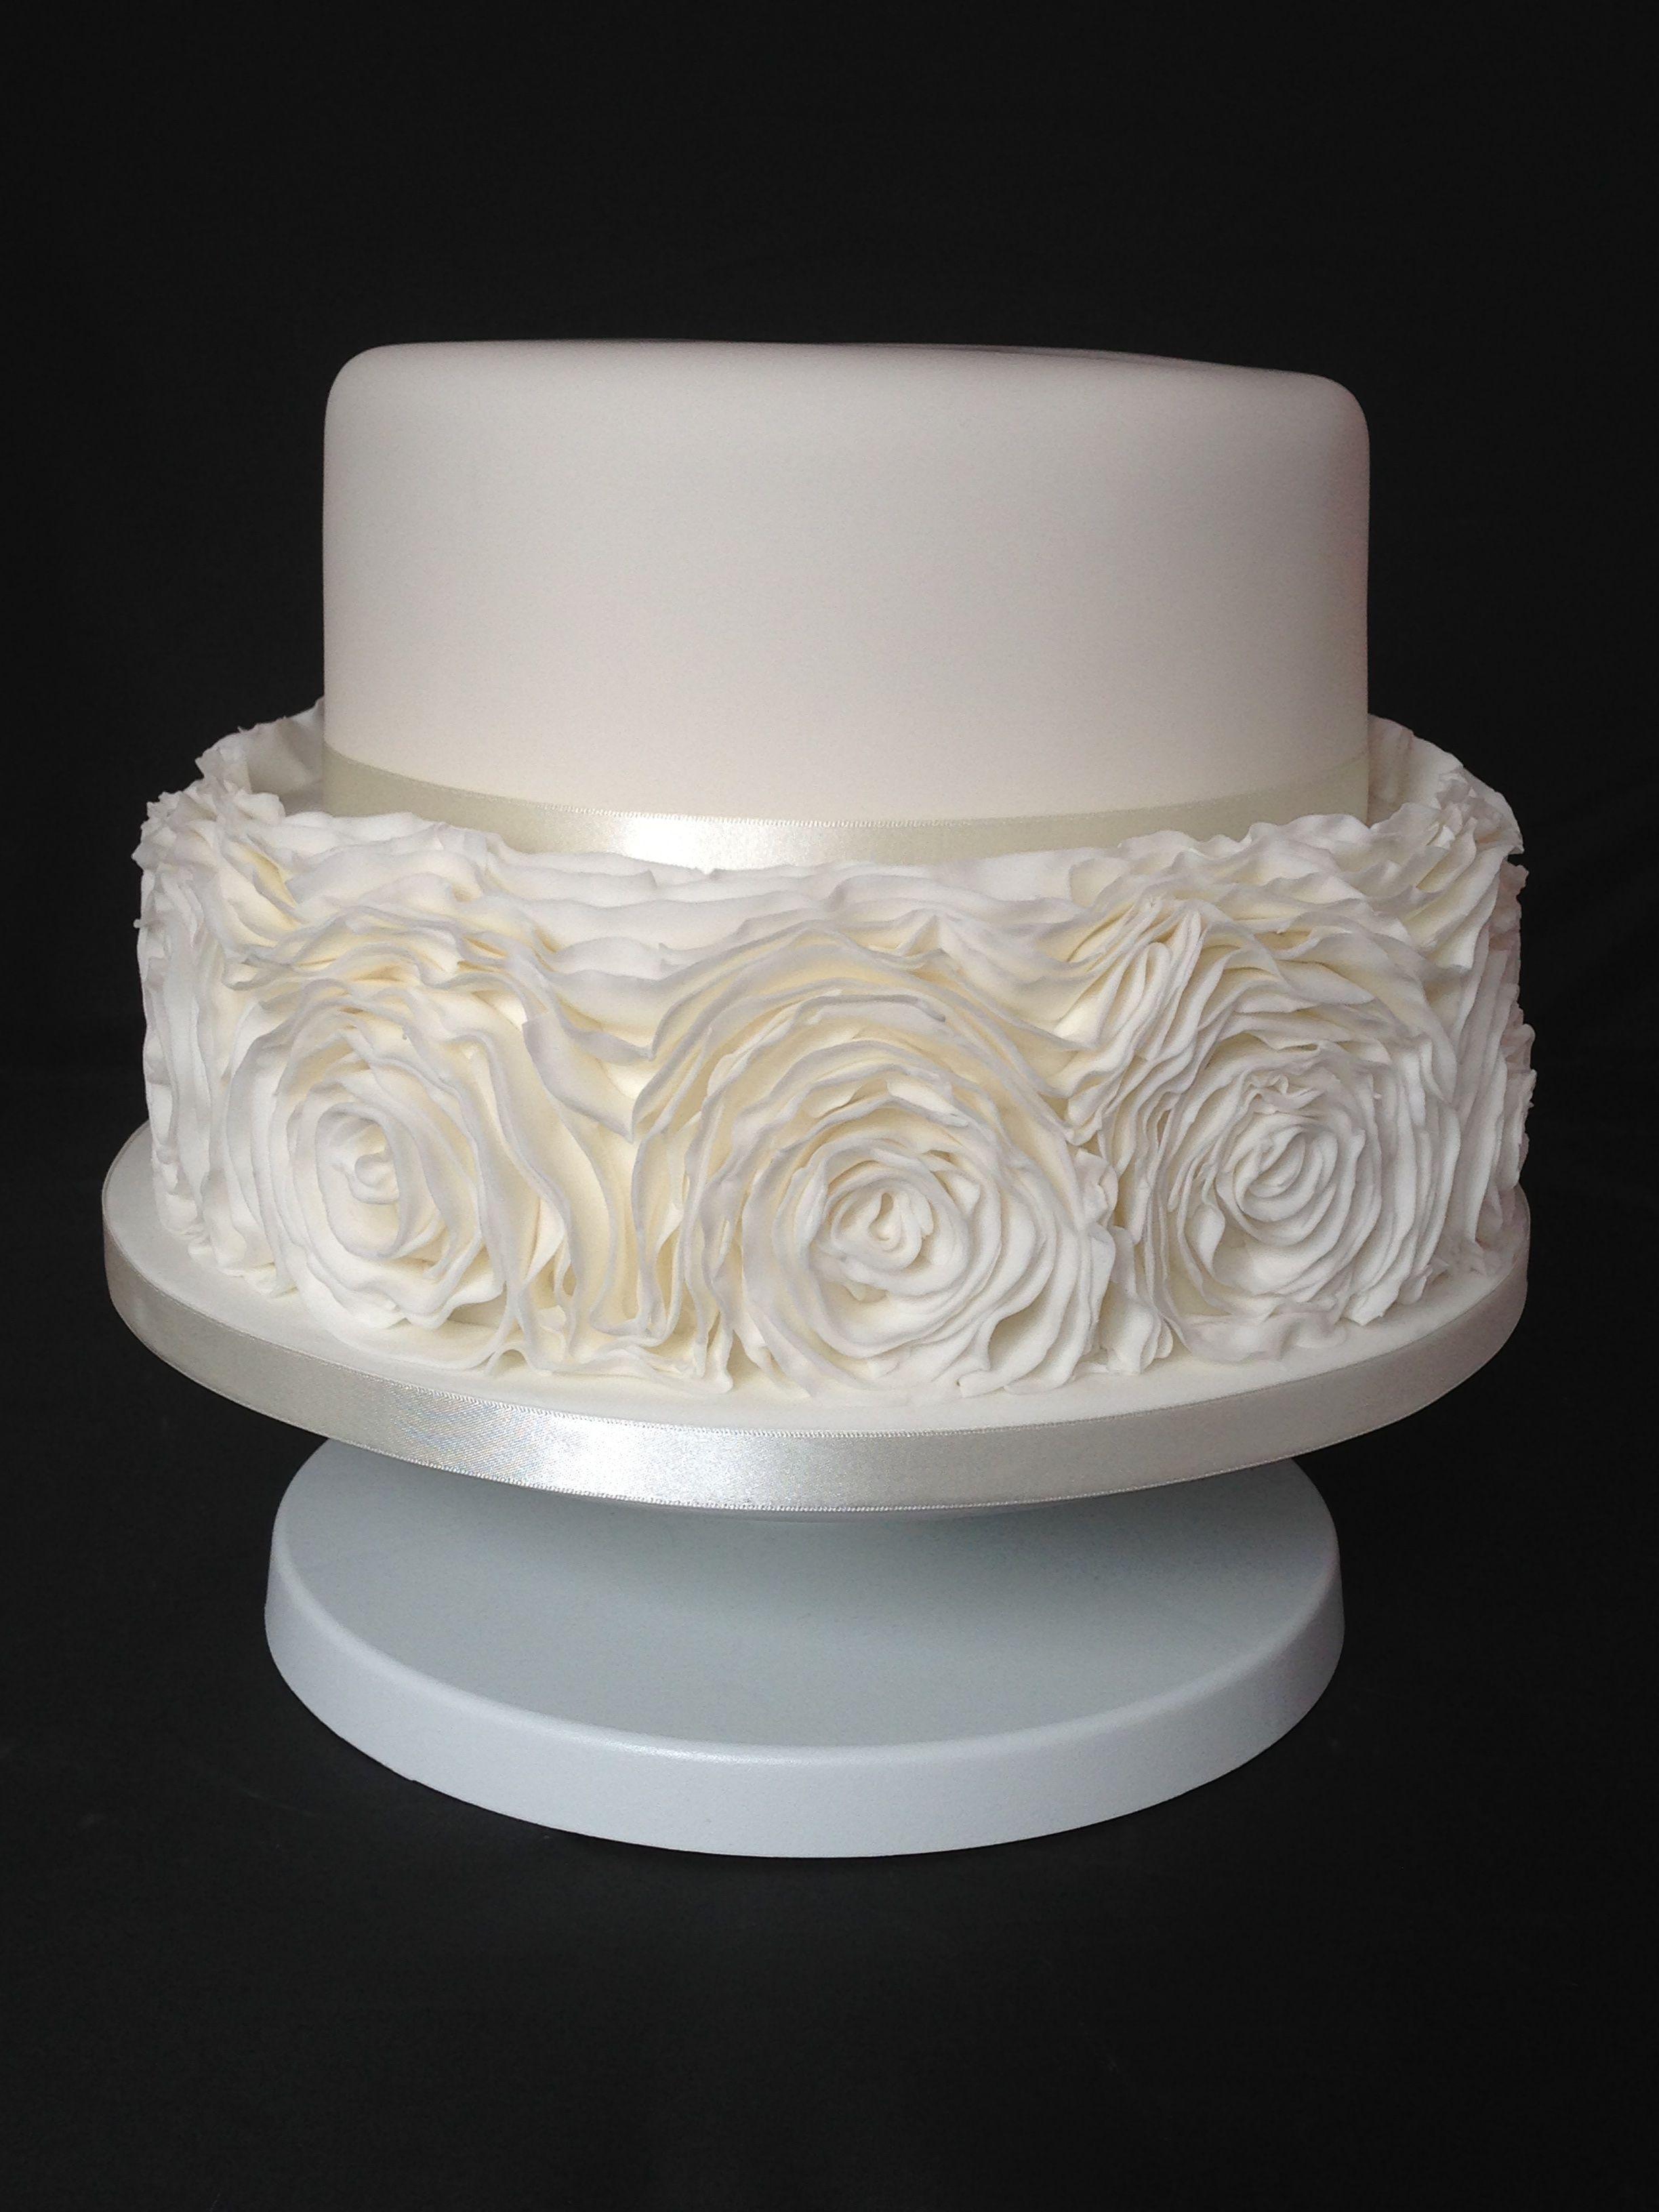 Ruffle Two Tier Wedding Cake To Replicate The Brides Dress